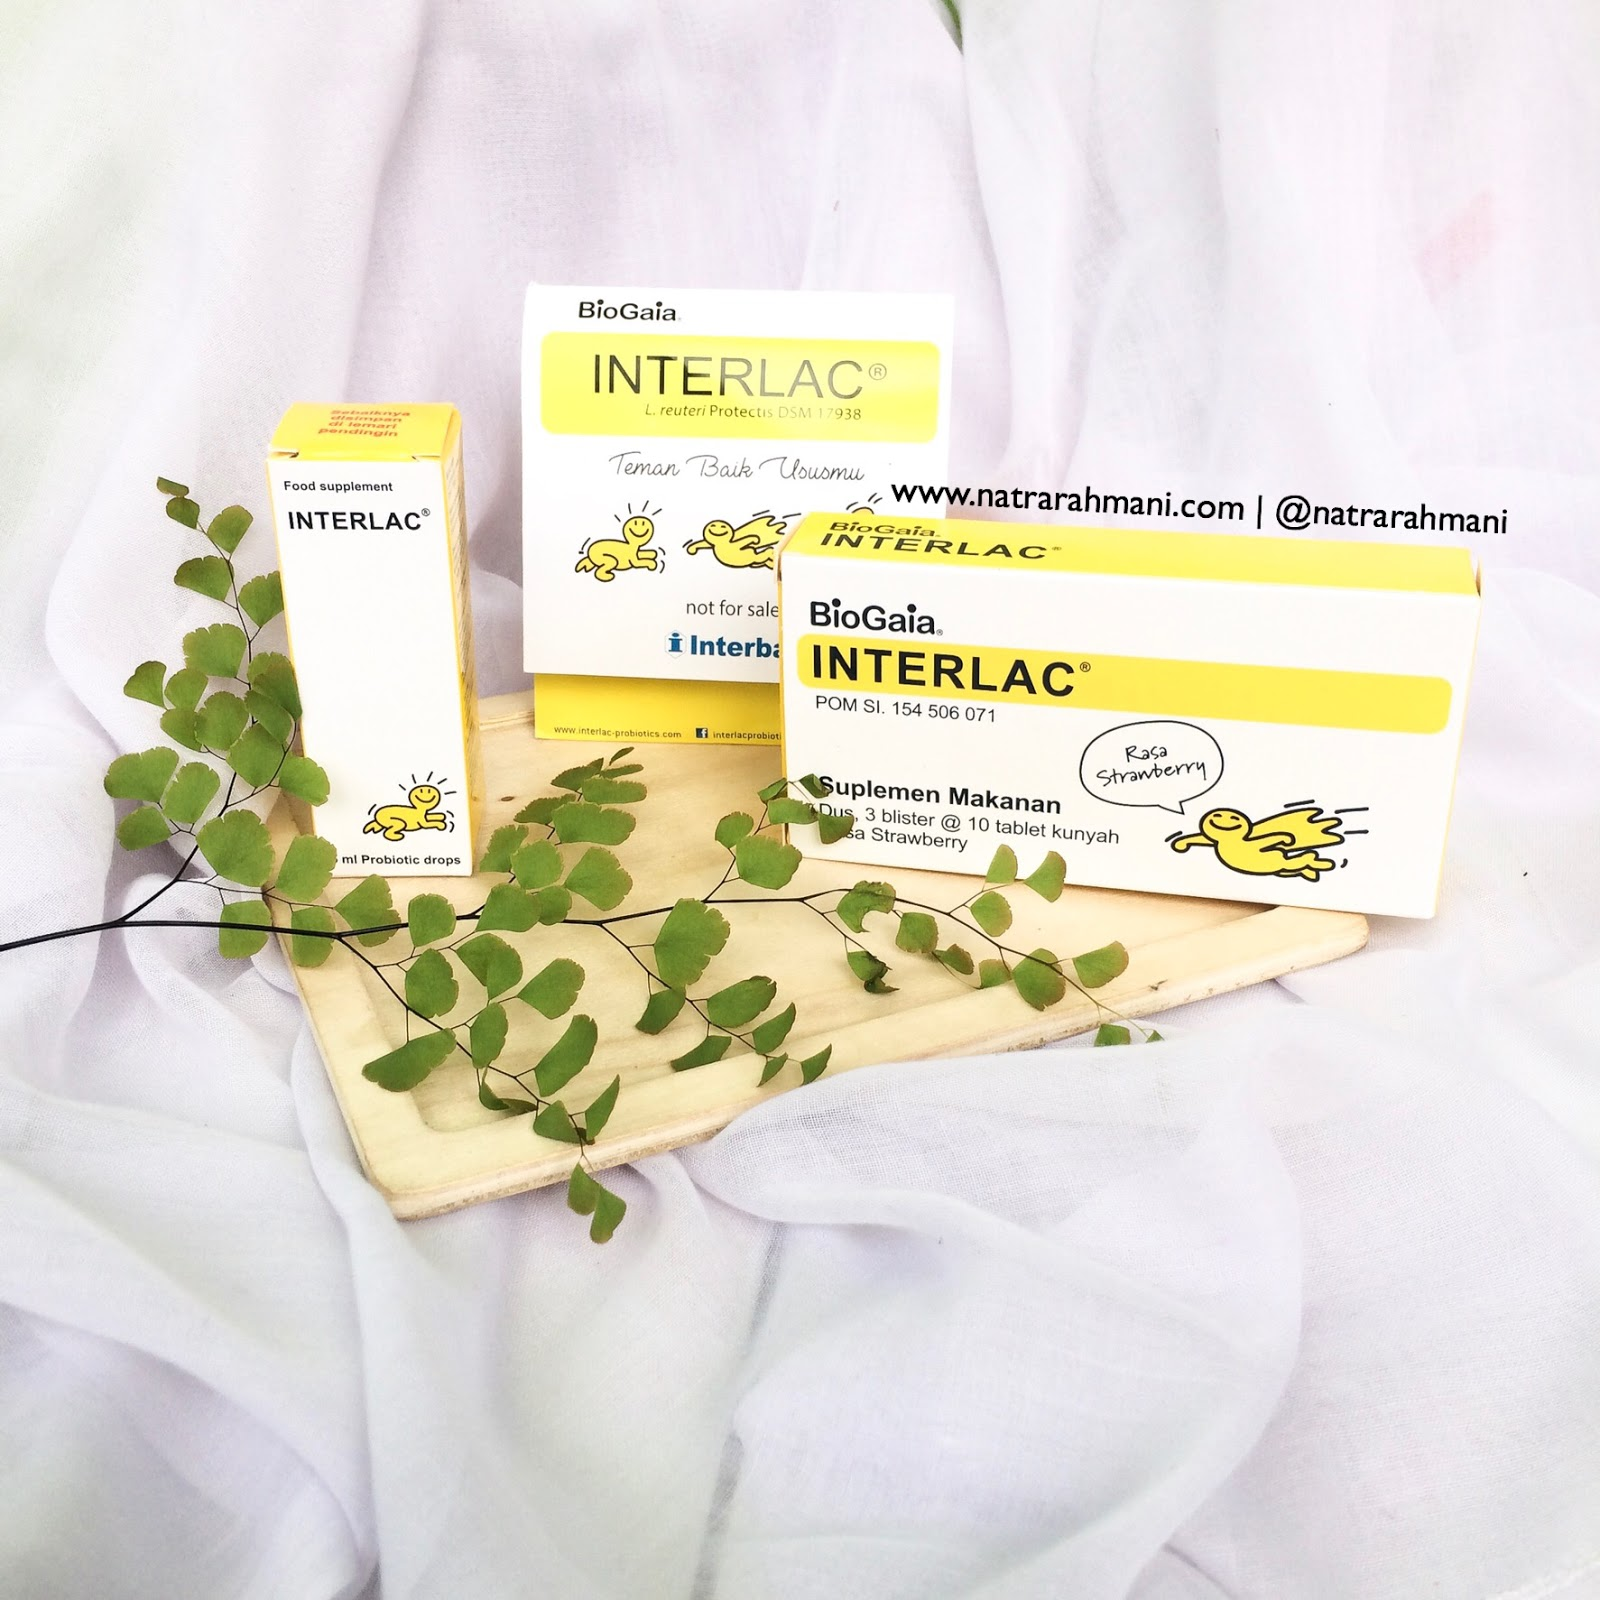 interlac-probiotics-untuk-kesehatan-cerna-si-buah-hati-natrarahmani